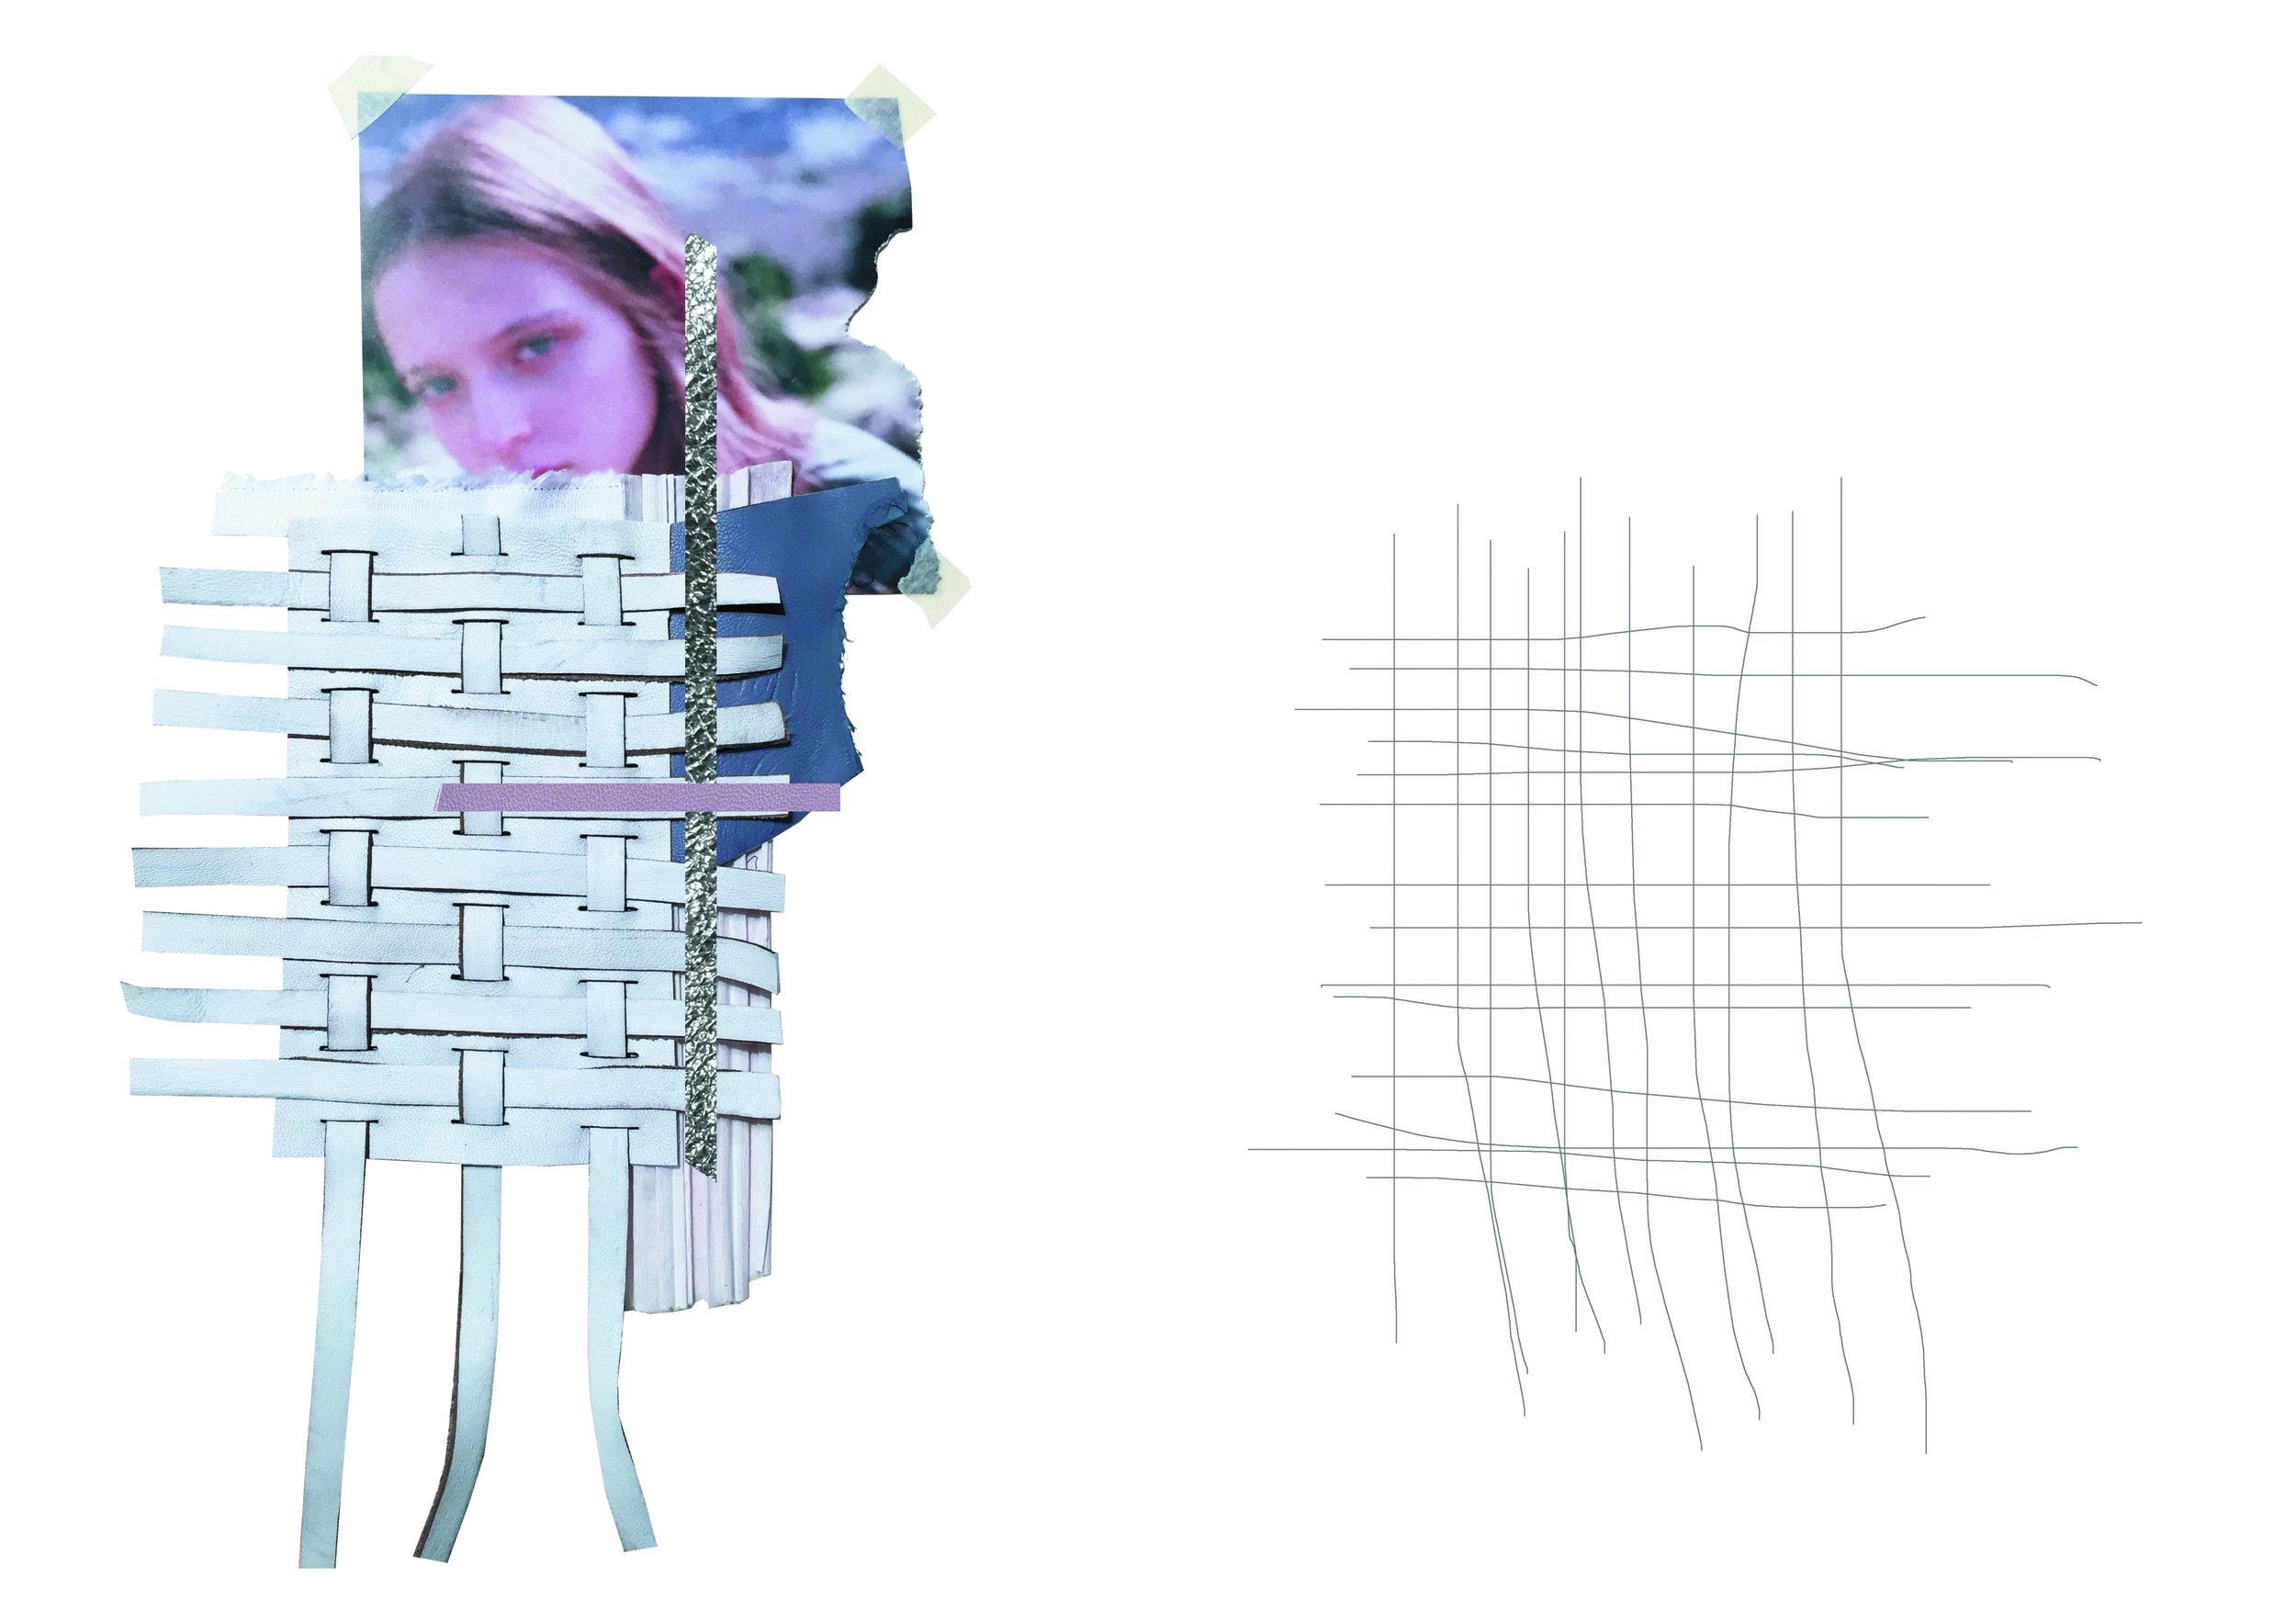 Allie_Howard_Process15.jpg